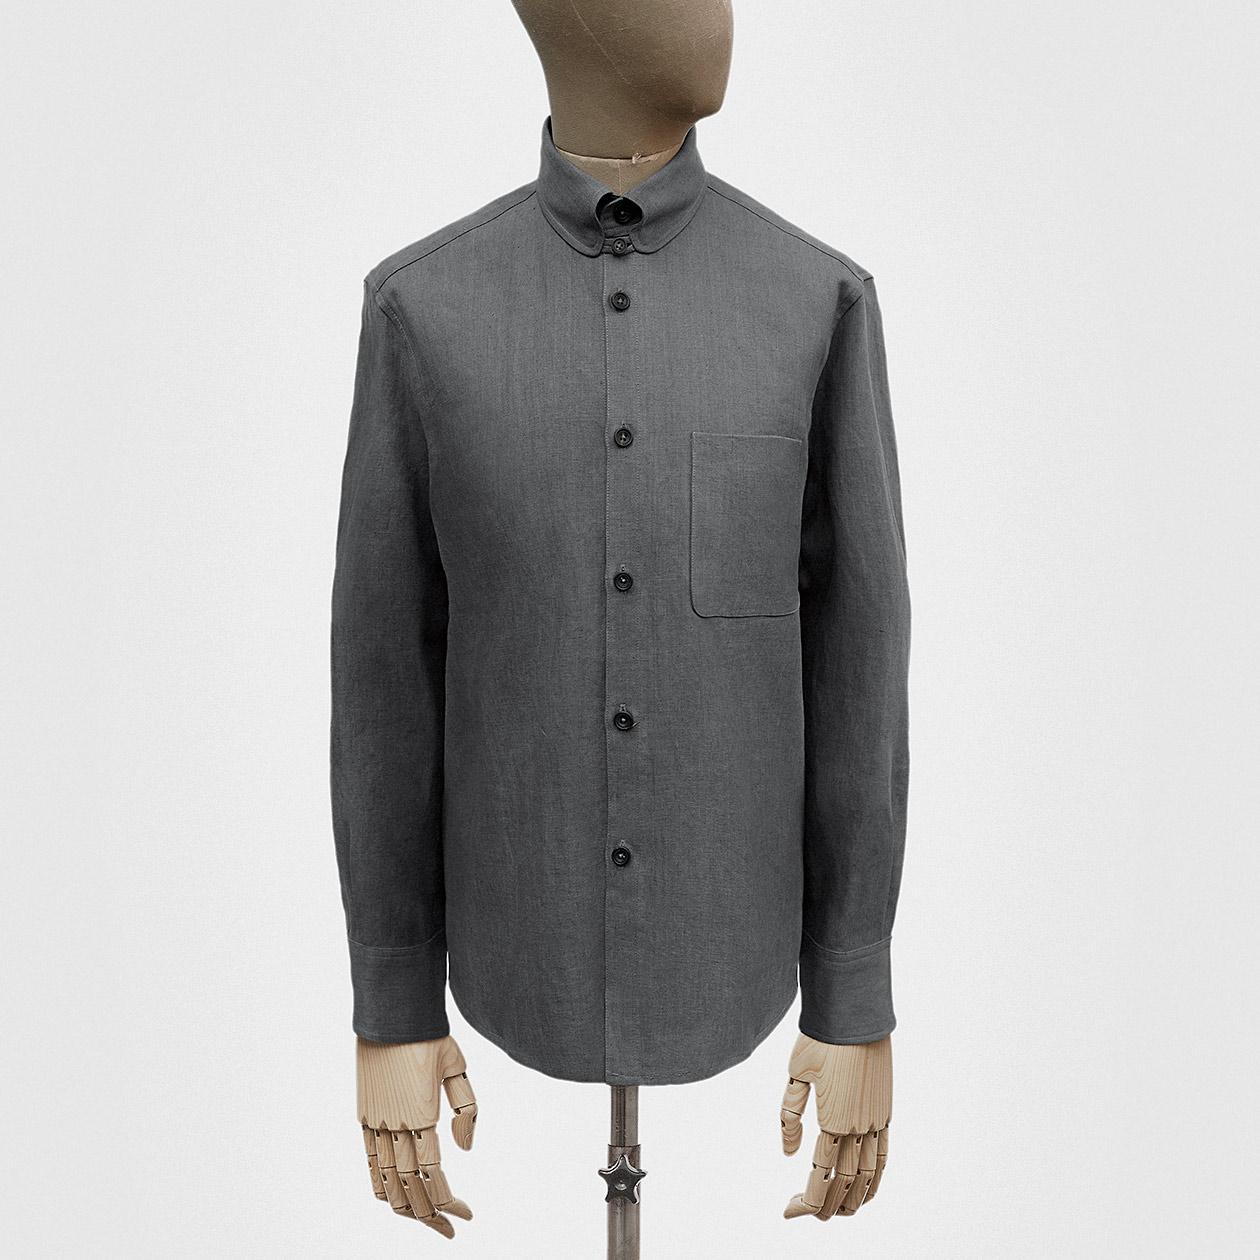 shirt-kelly-collar-tailor-linen-grey-1@2x.jpg